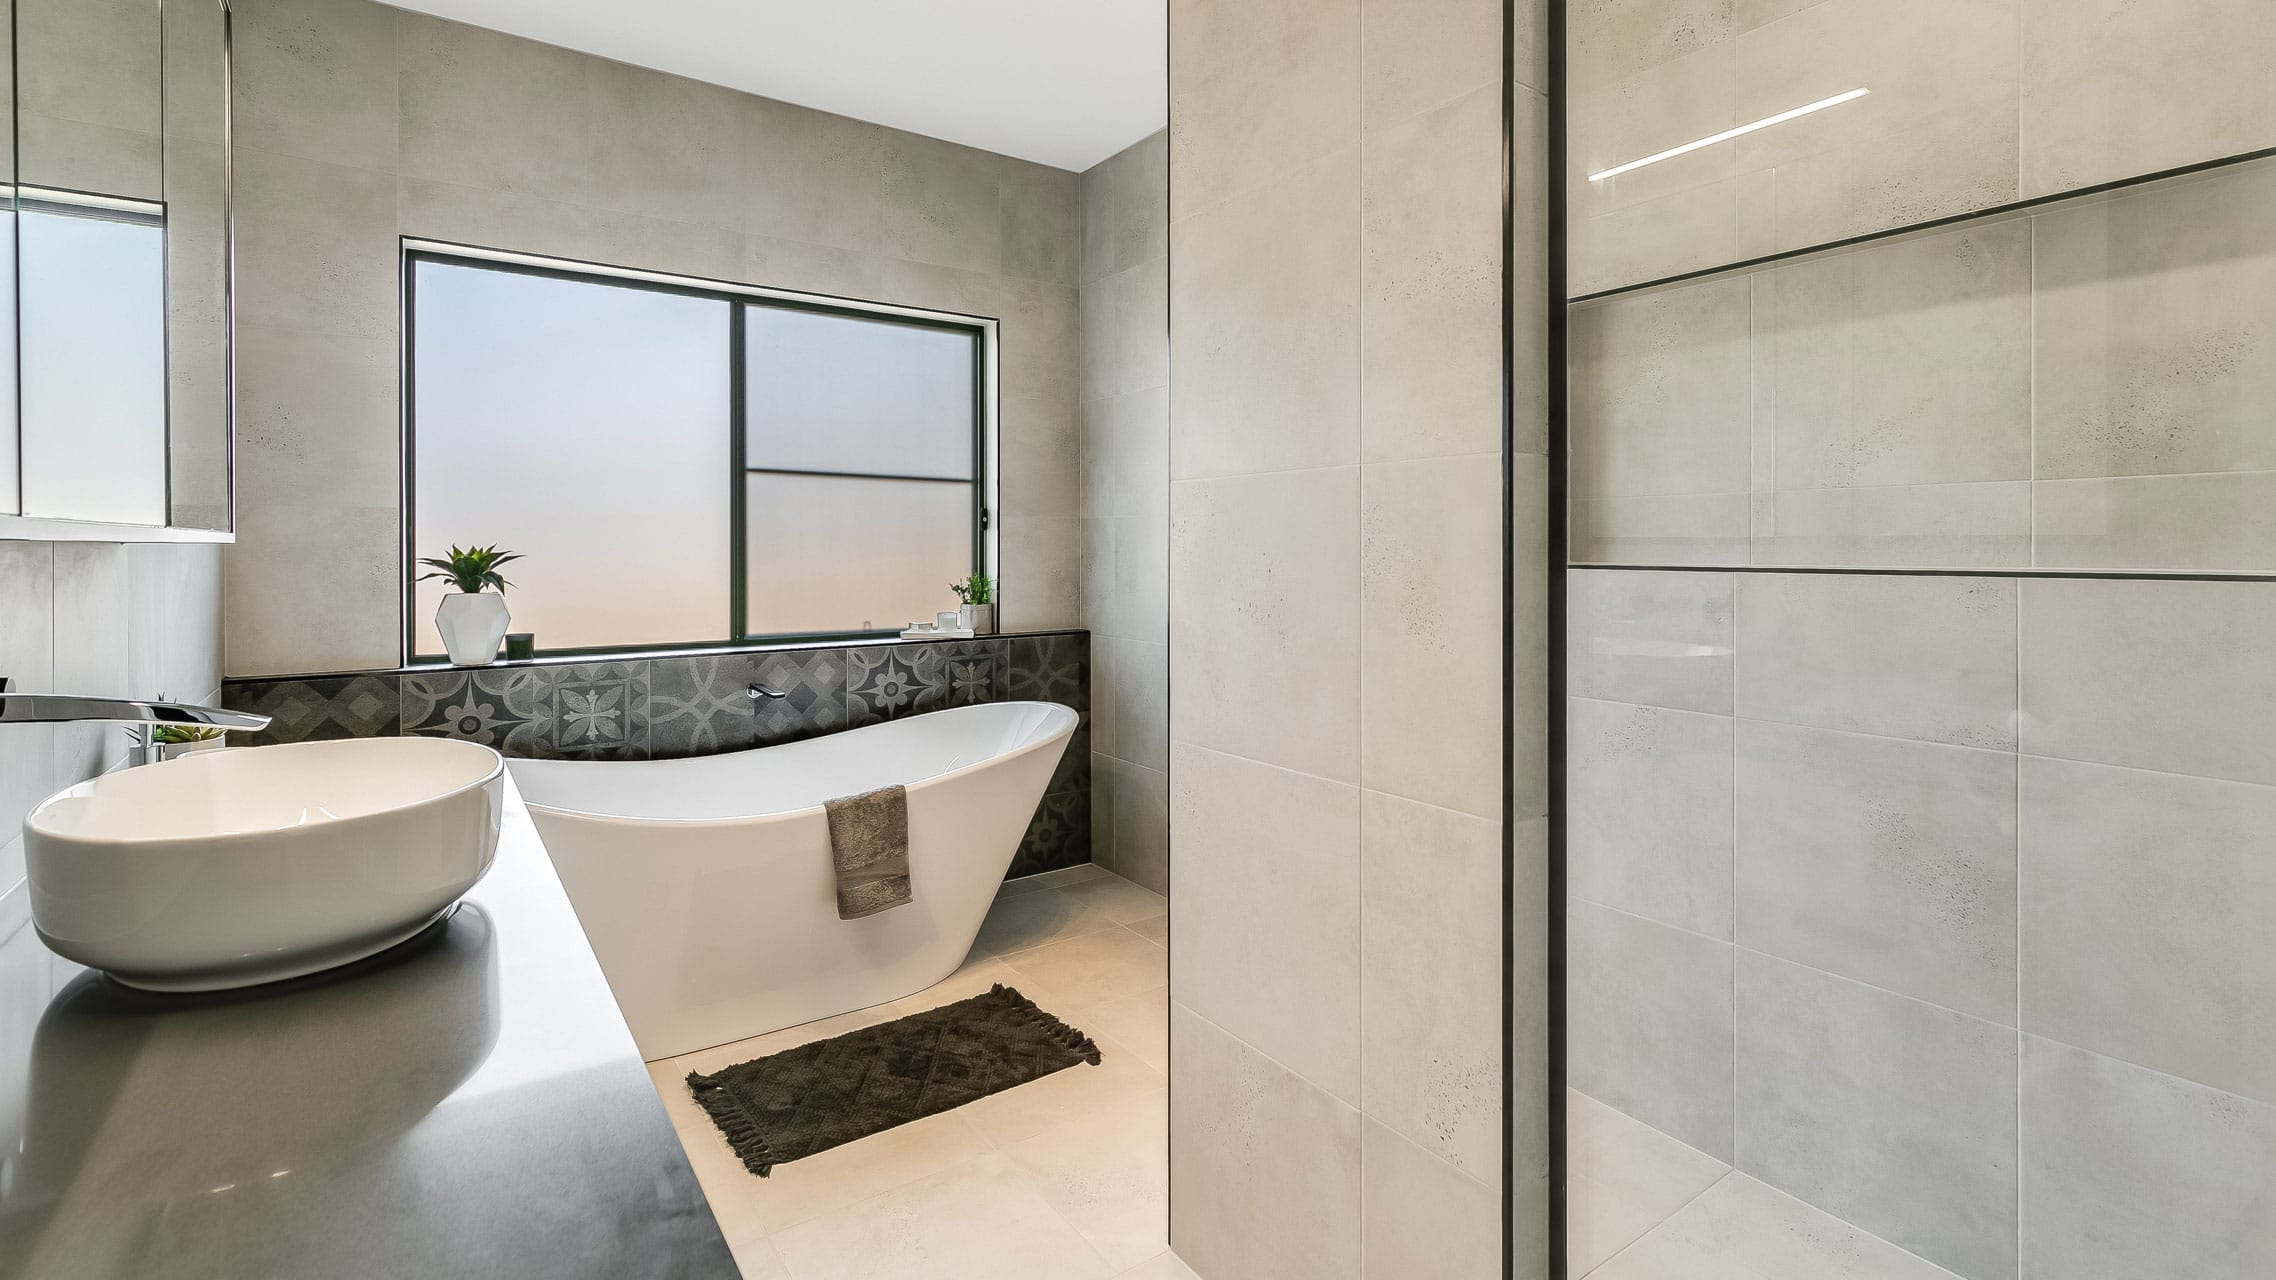 Sliding Window in bathroom